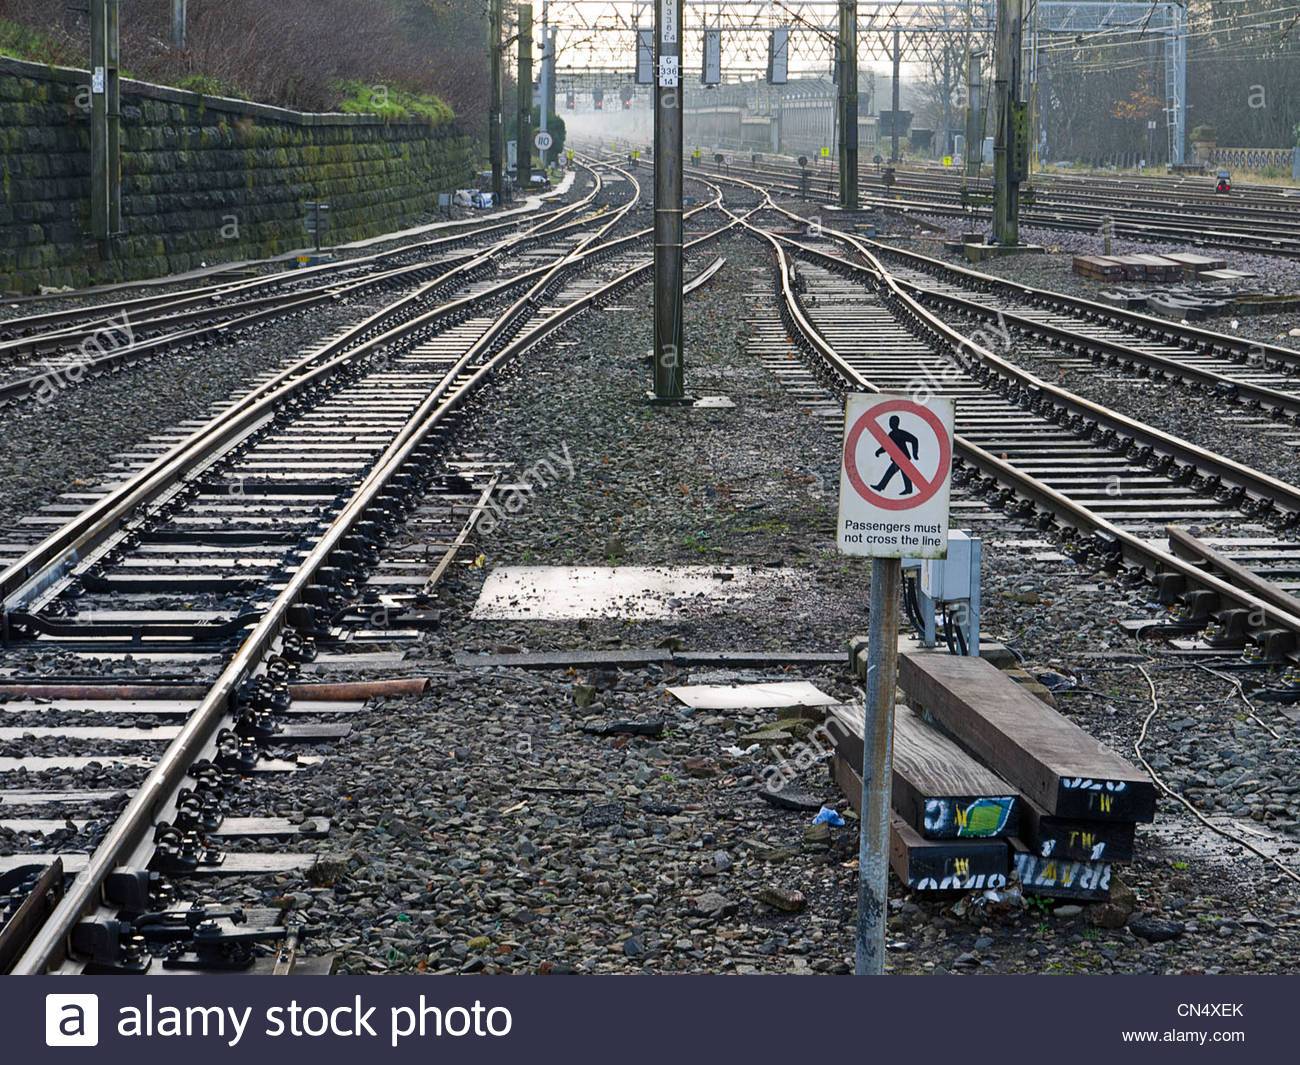 Railway Lines Junction Danger Passengers do not Cross - Stock Image